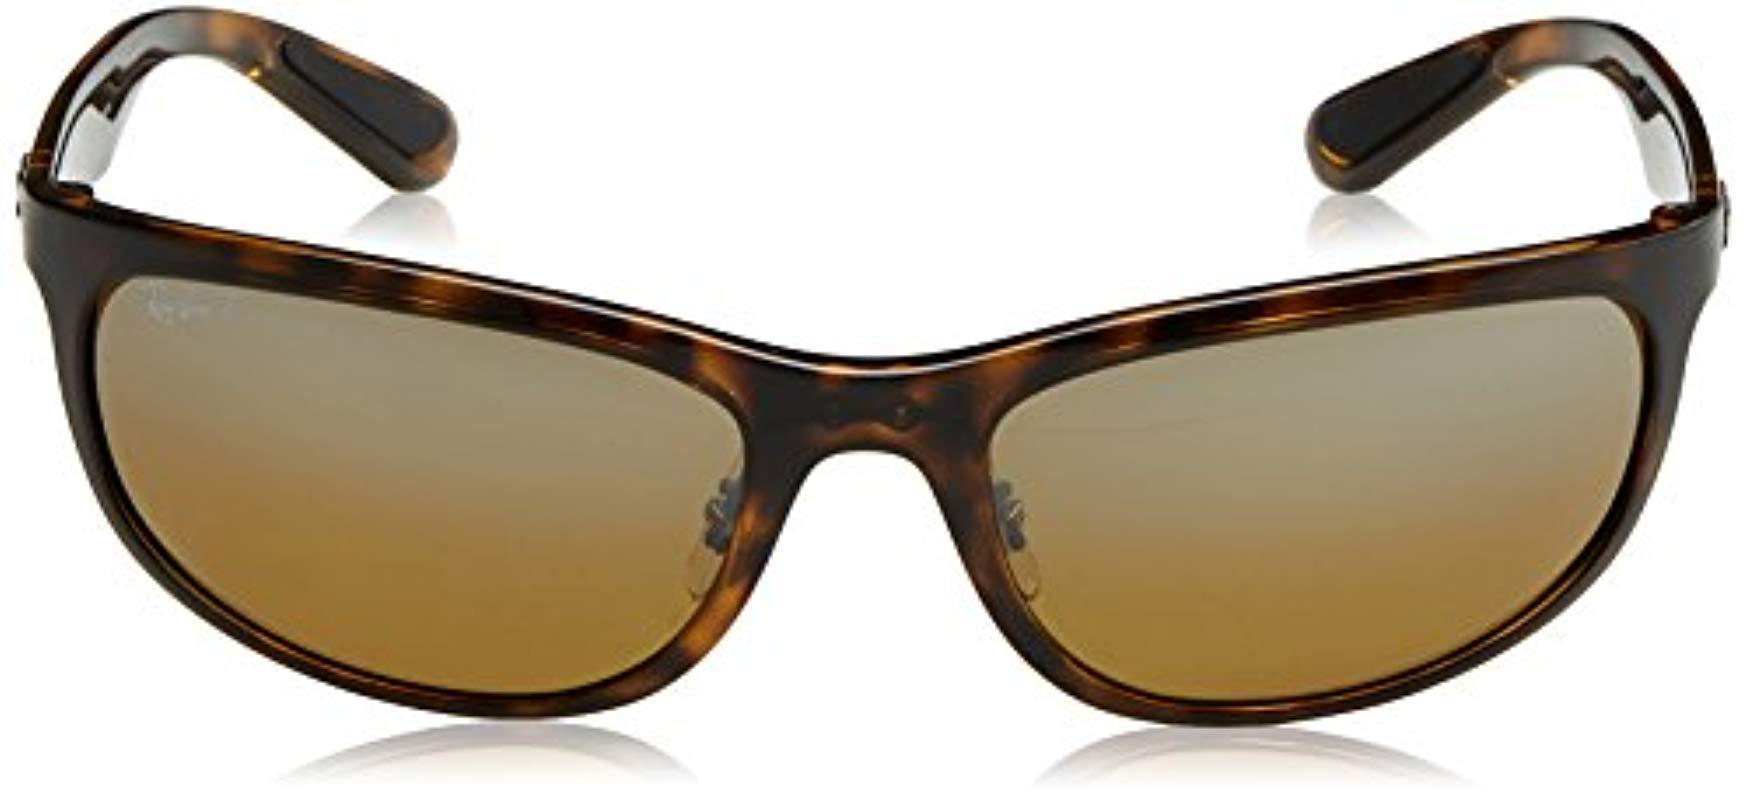 dadd87ae705 Ray-Ban - Brown Rb4265 Chromance Lens Wrap Sunglasses for Men - Lyst. View  fullscreen